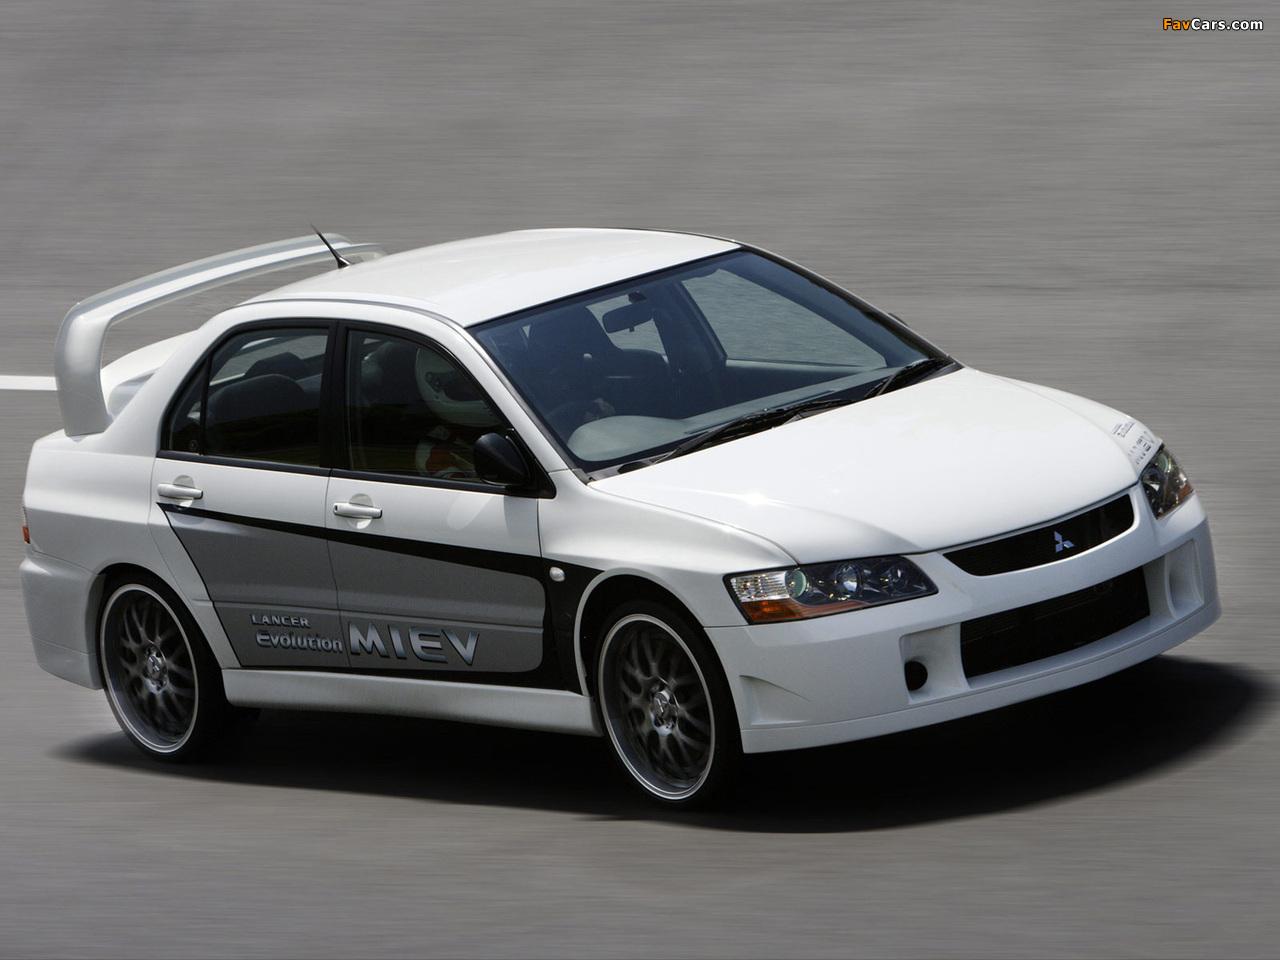 Mitsubishi Lancer Evolution MIEV Concept 2005 photos (1280 x 960)